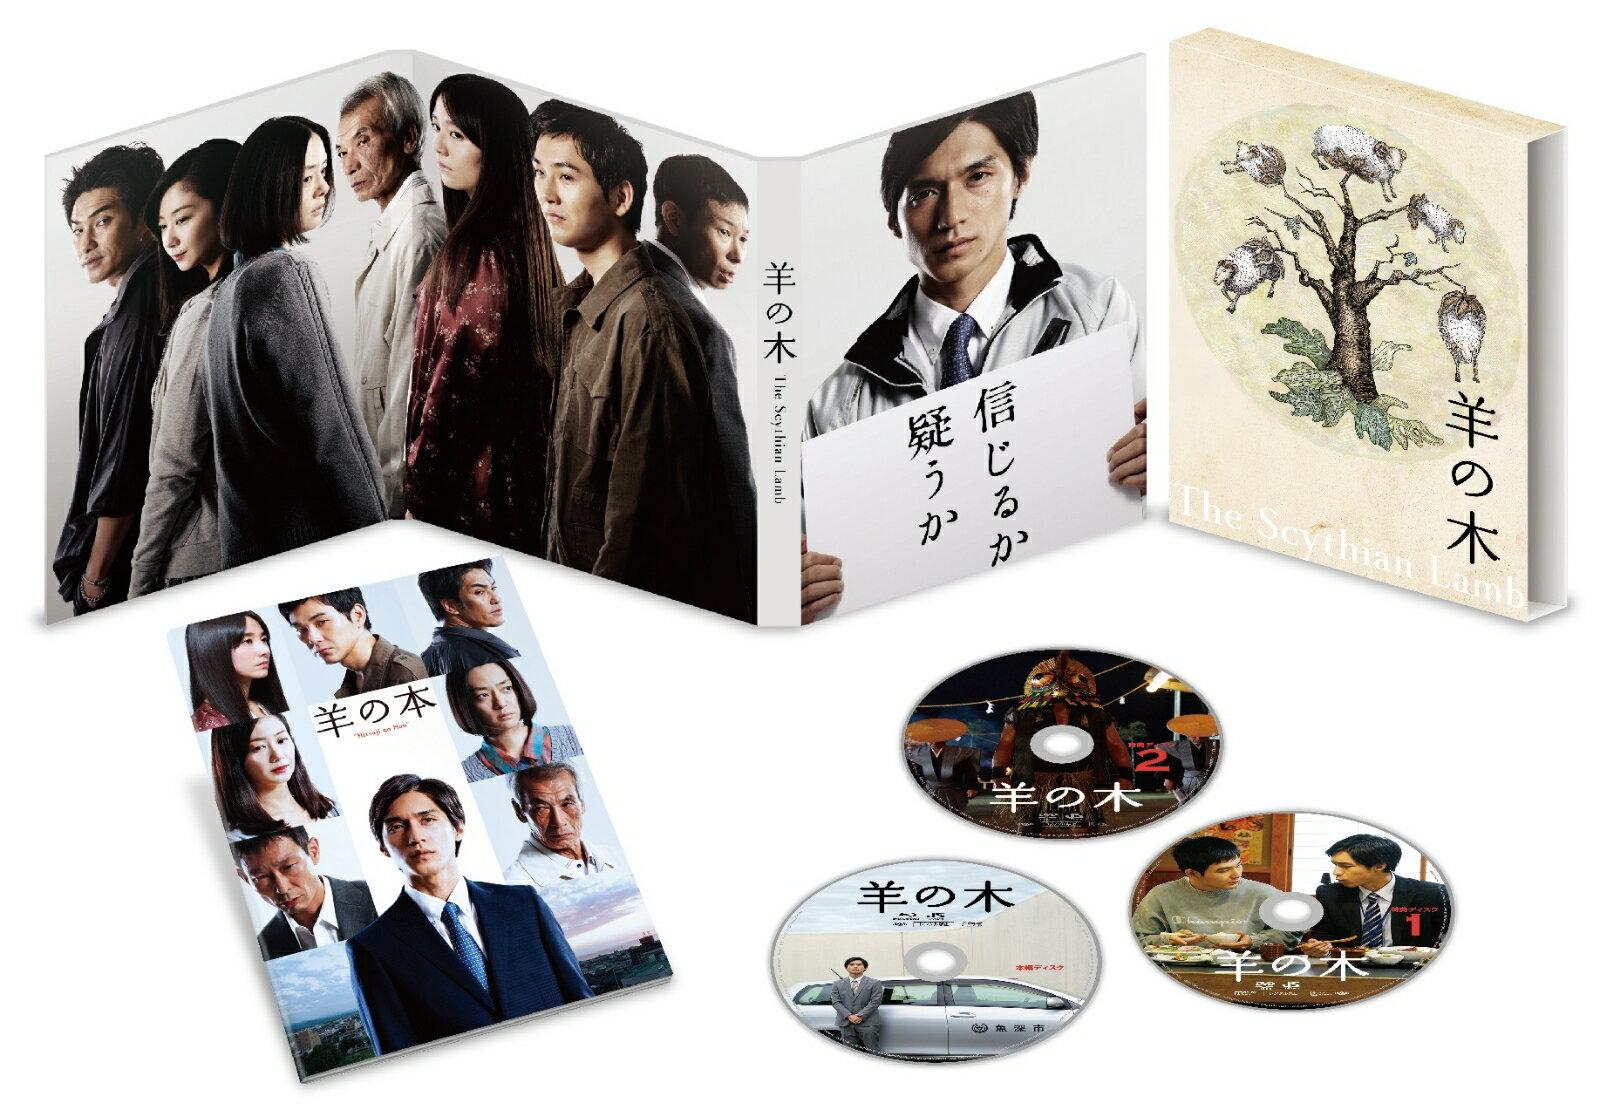 映画「羊の木」 Blu-ray豪華版(Blu-ray+2DVD)【Blu-ray】